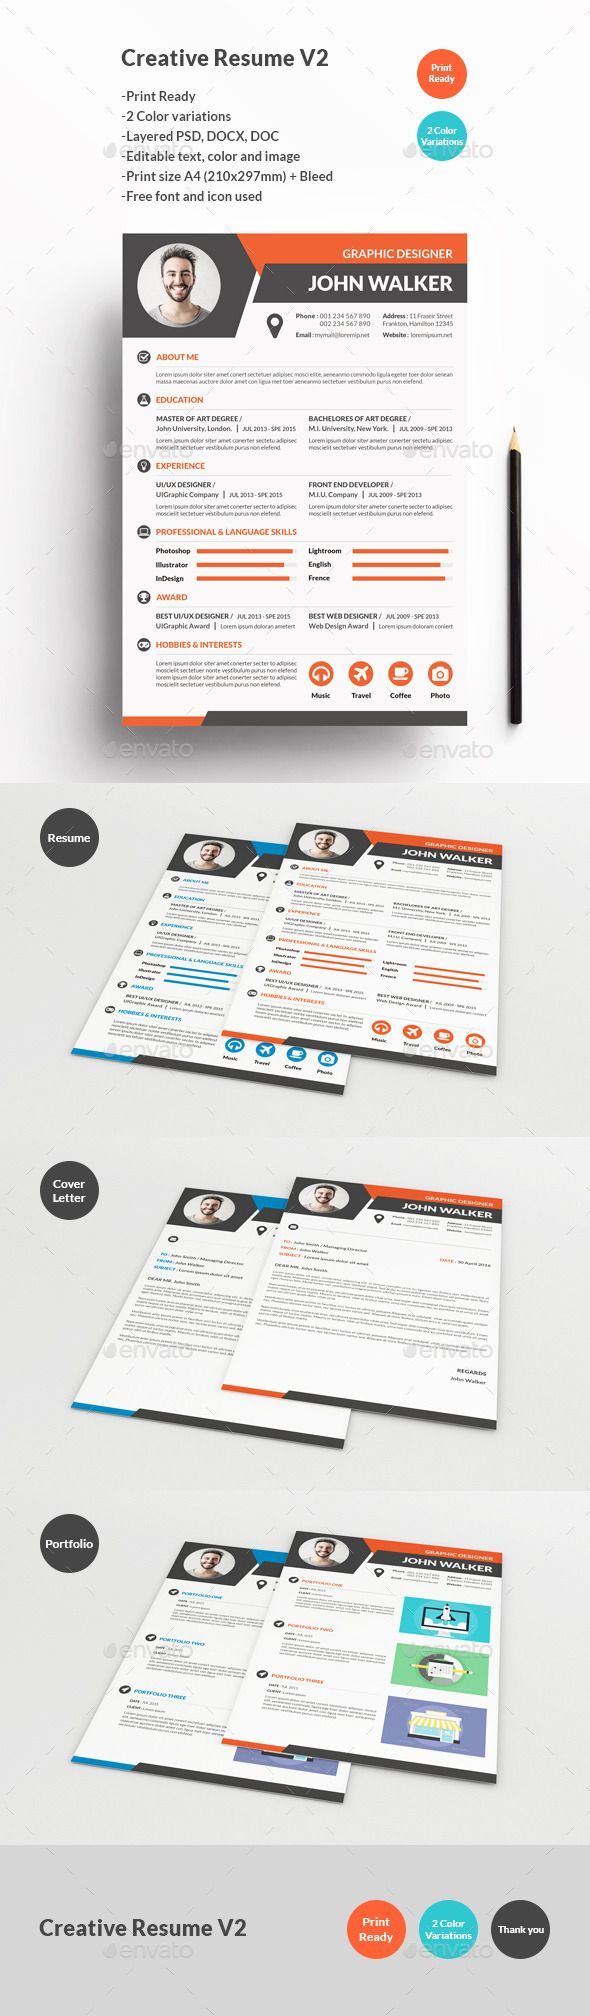 Creative Resume V2 1534 best Resume Design